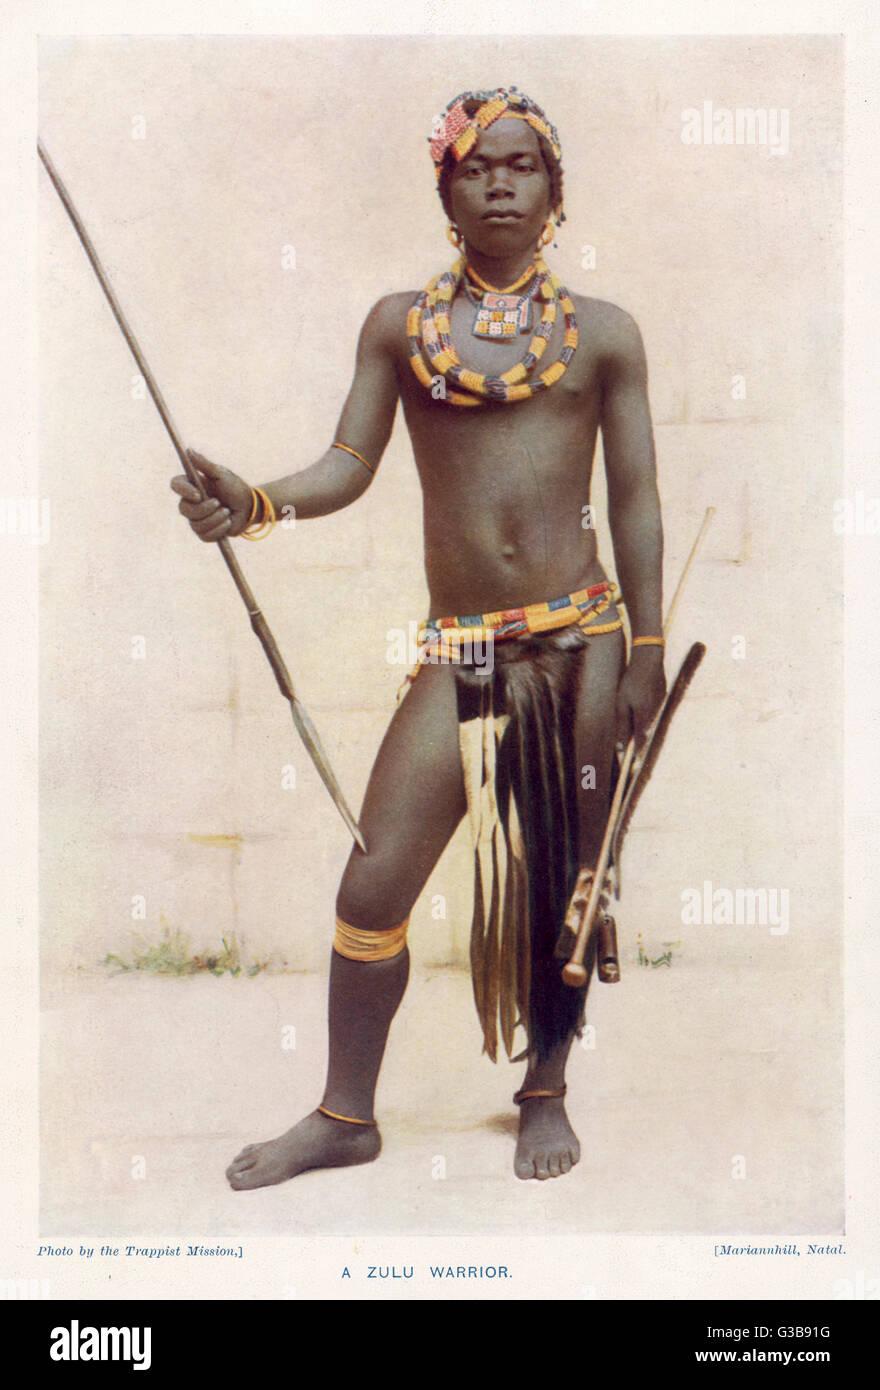 Zulu damer dating